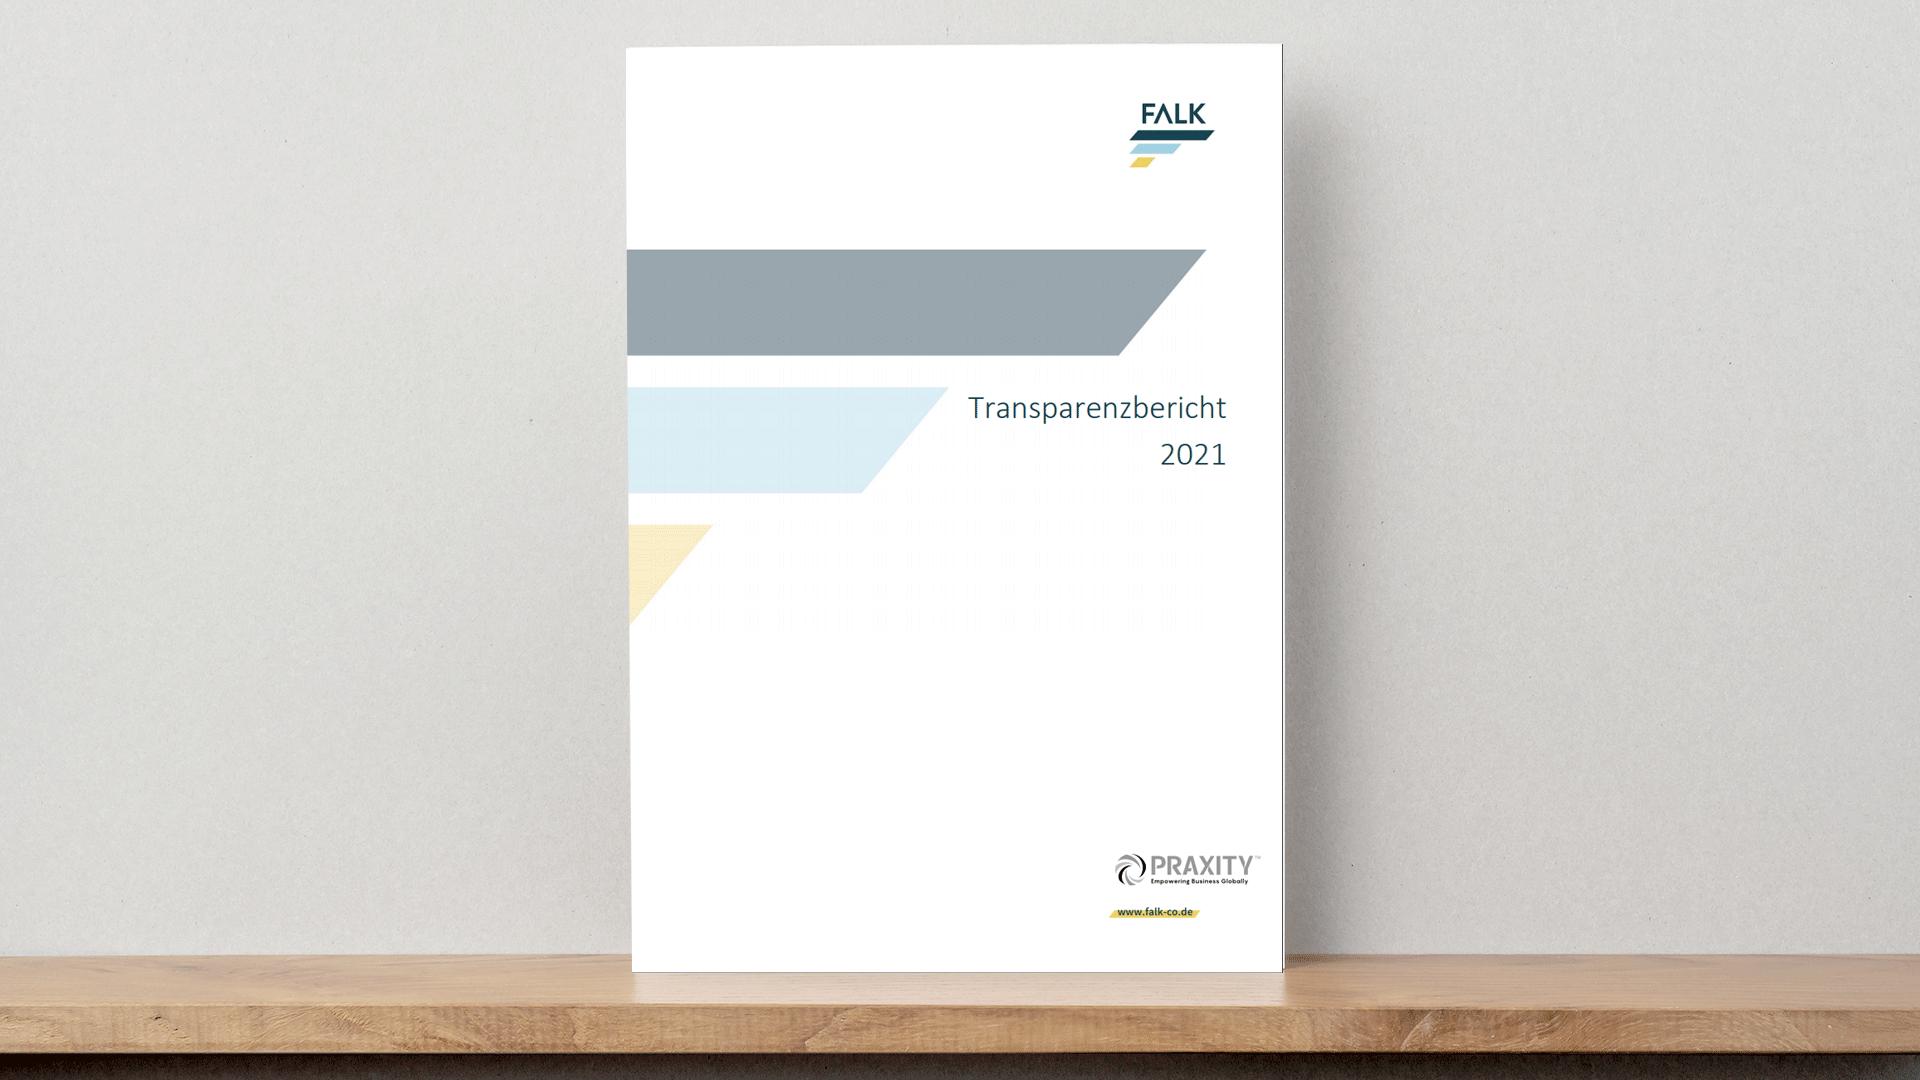 Transparenzbericht 2021